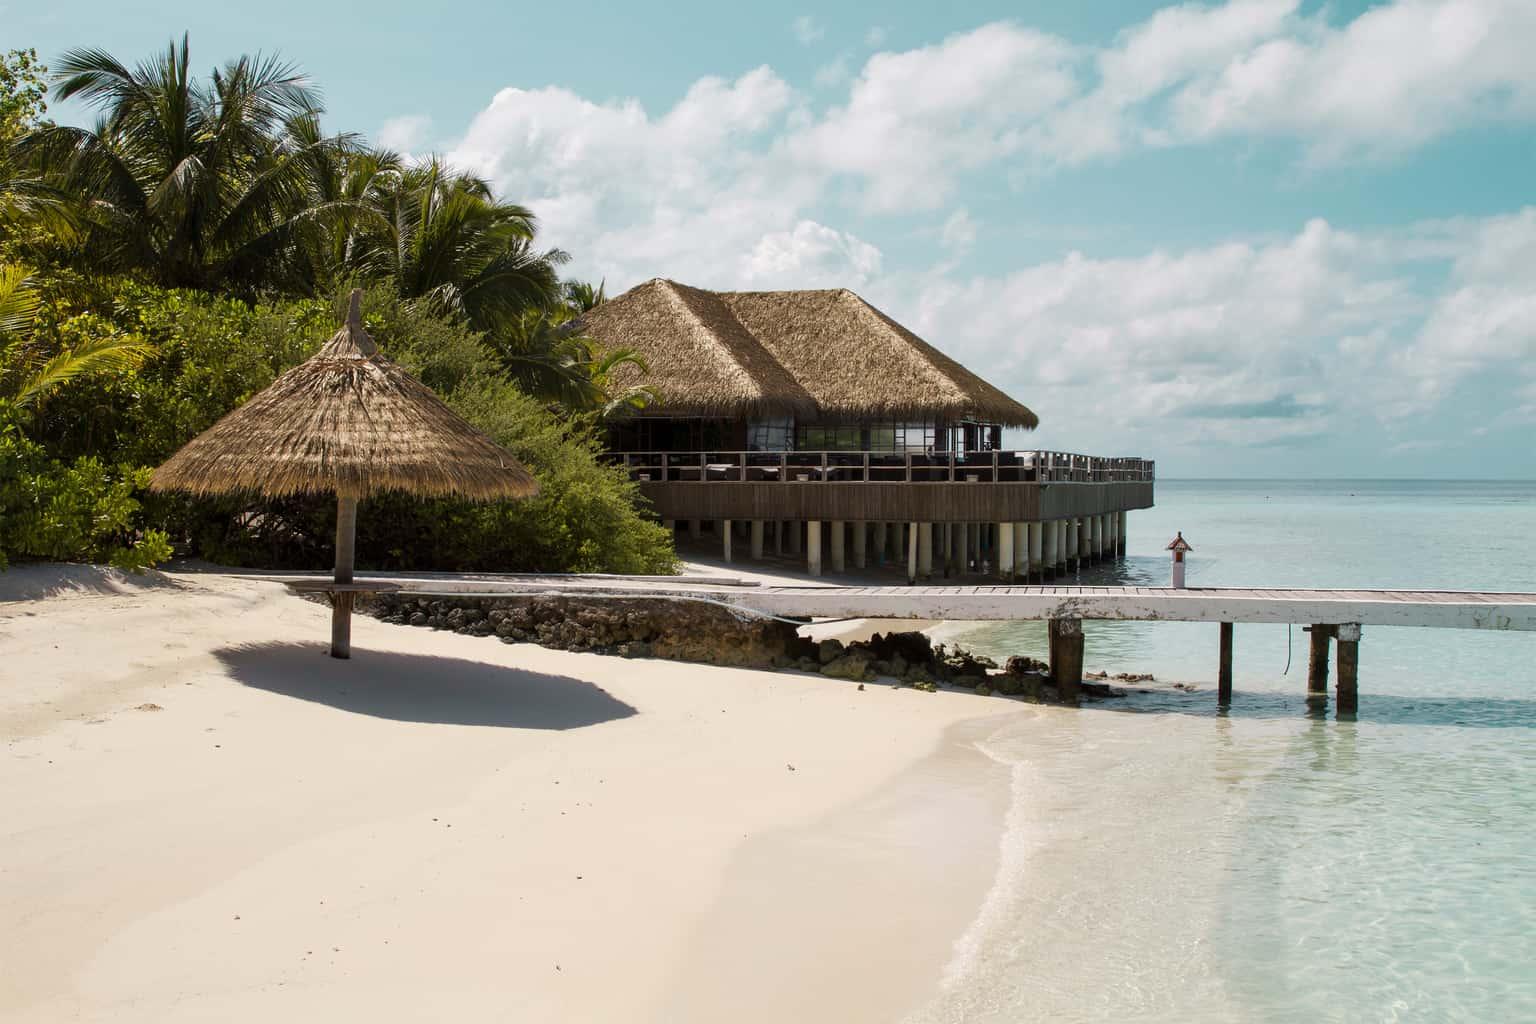 Maldives Diving Holiday Eriyadu Island pier